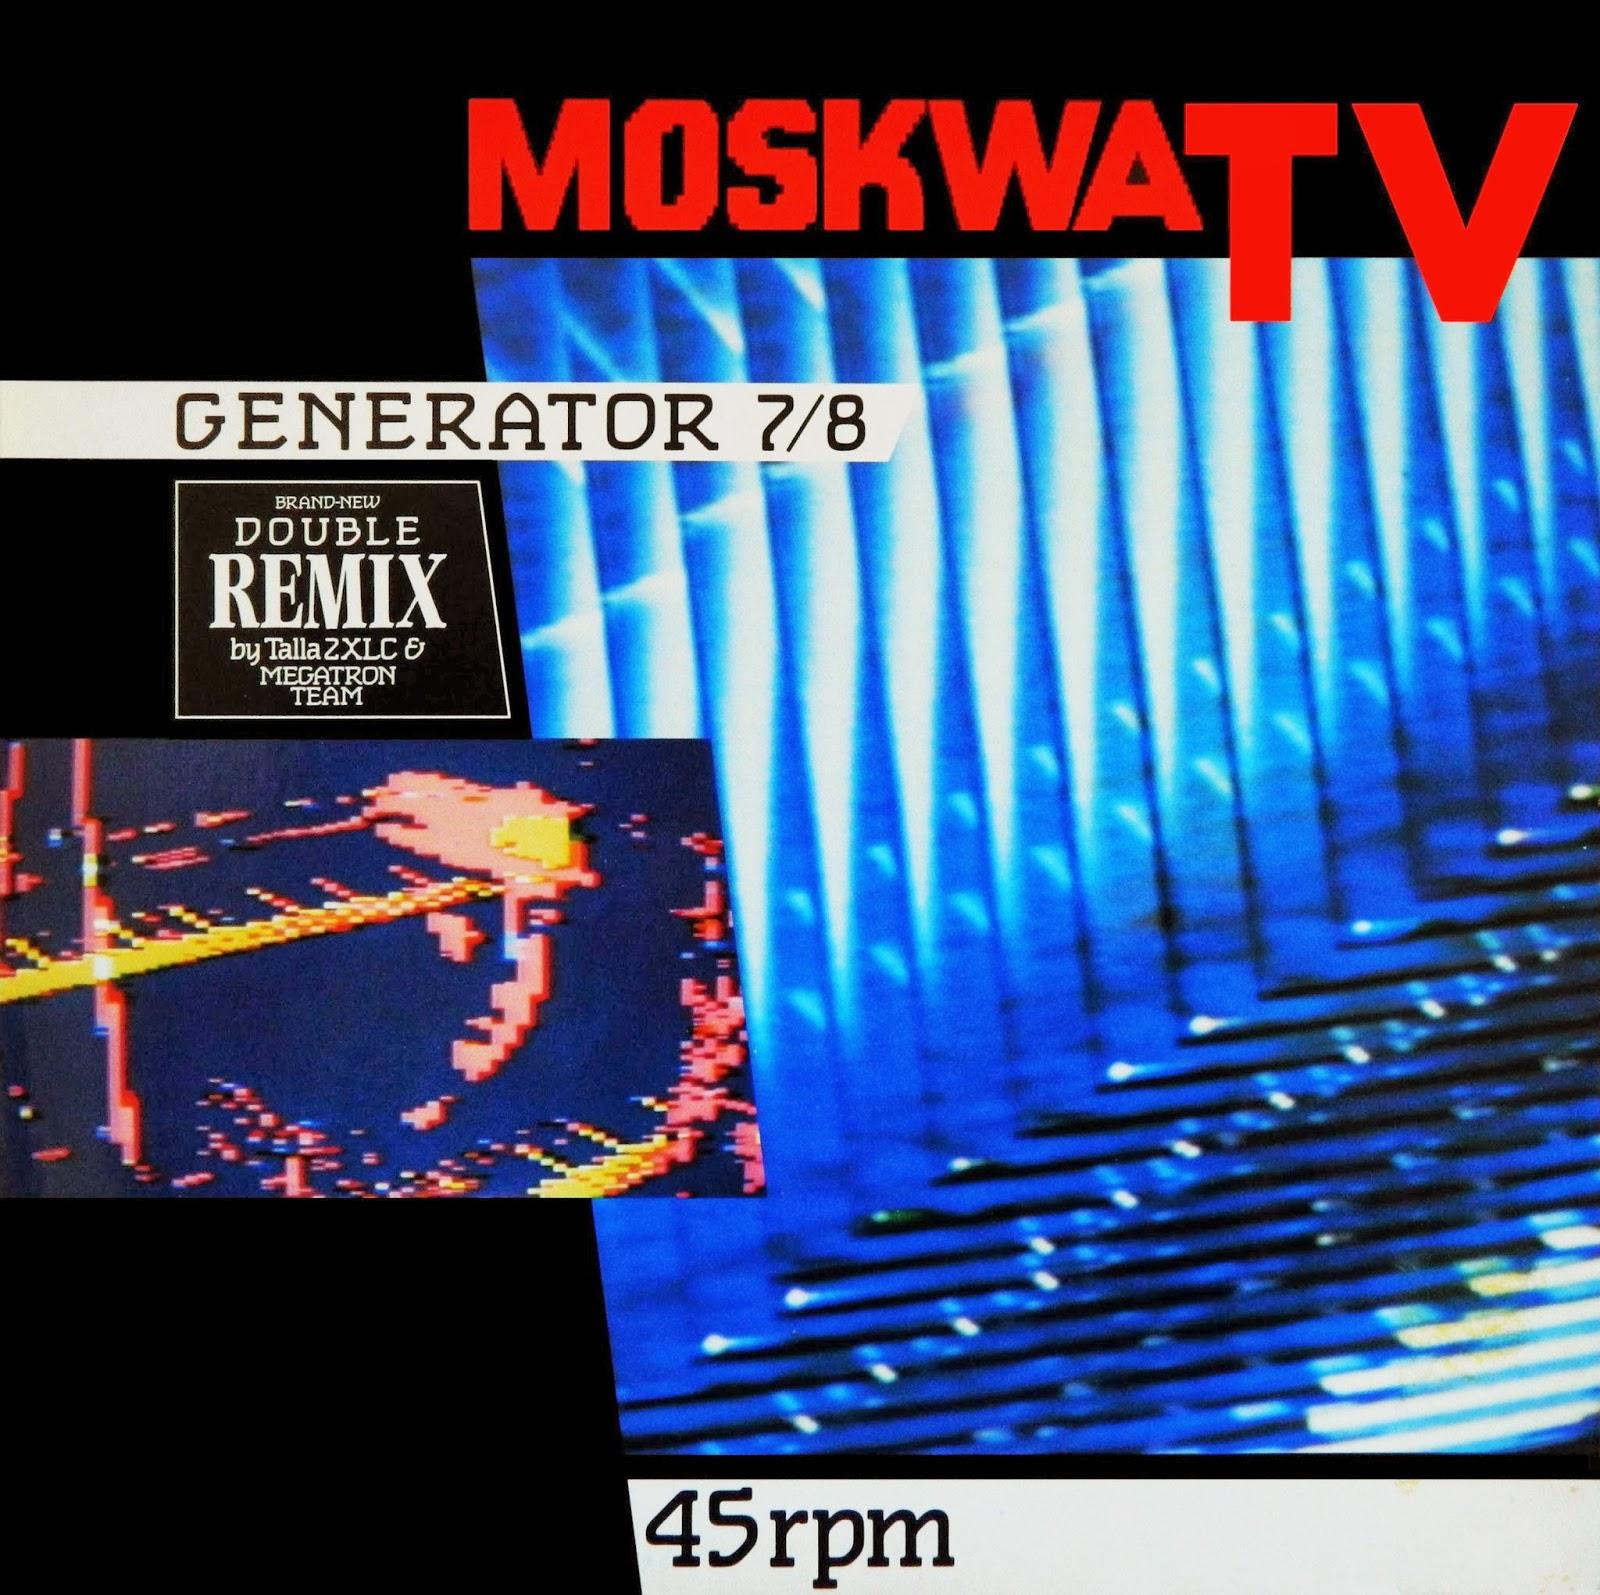 Moskwa TV Generator 78